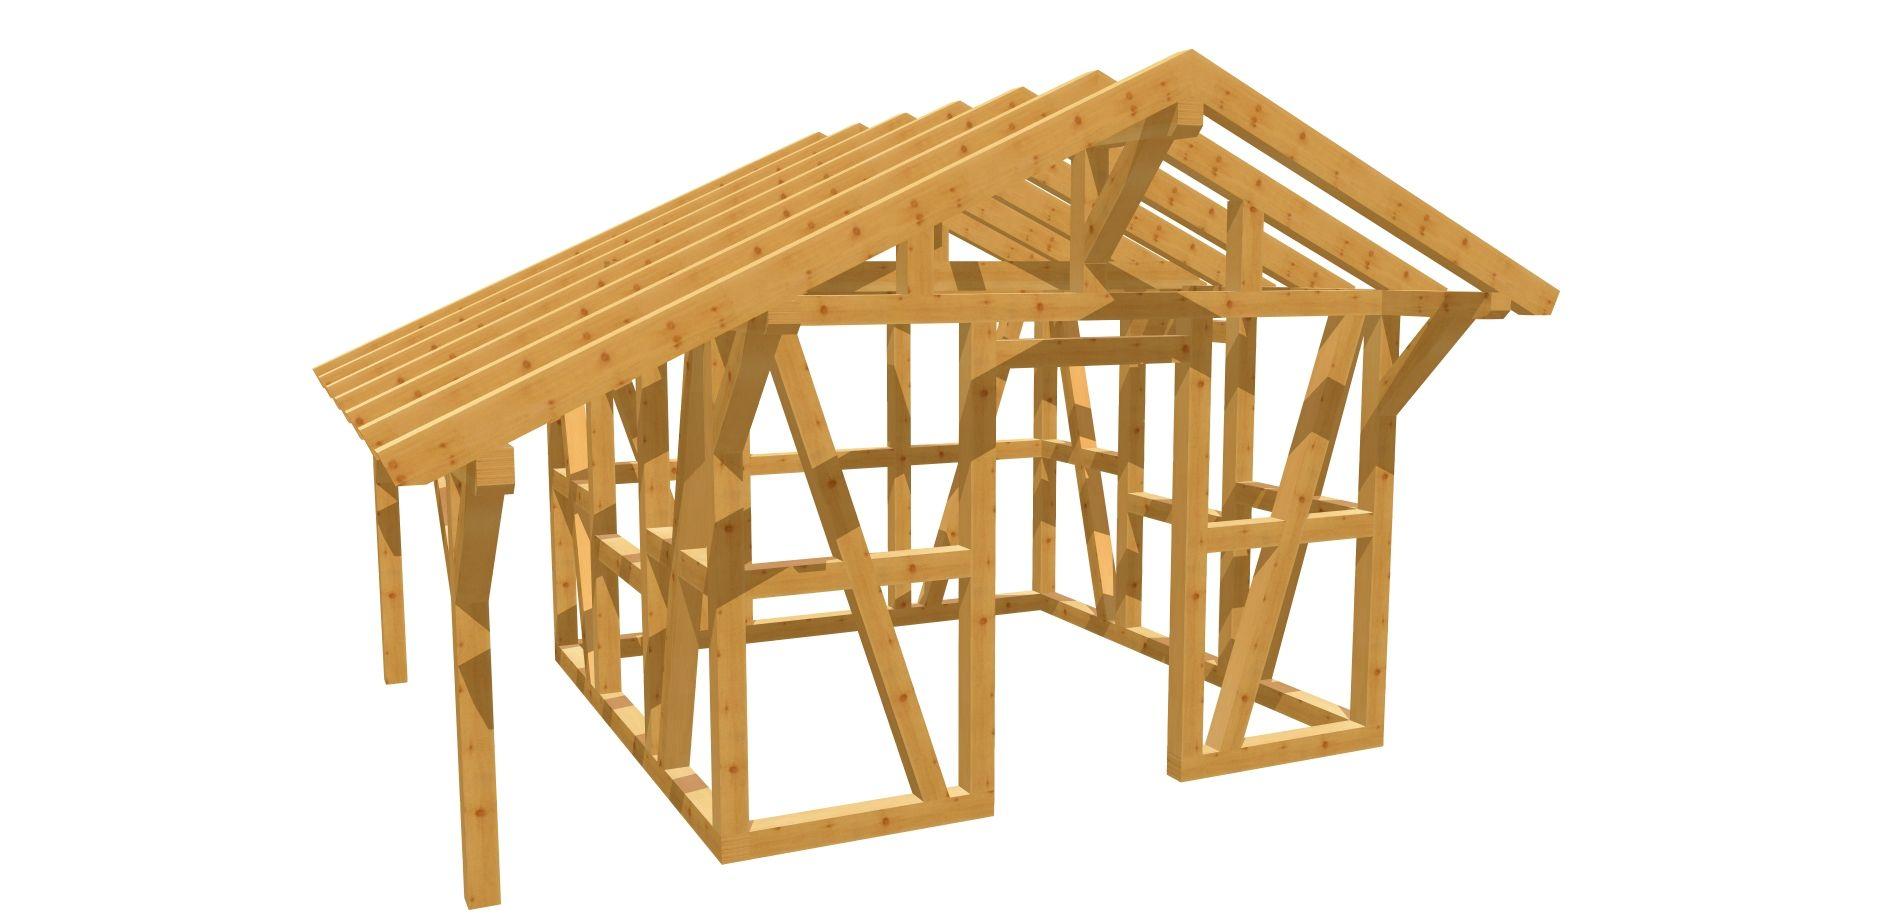 Gartenhaus Holz Gartenhaus holz, Gartenhaus selber bauen